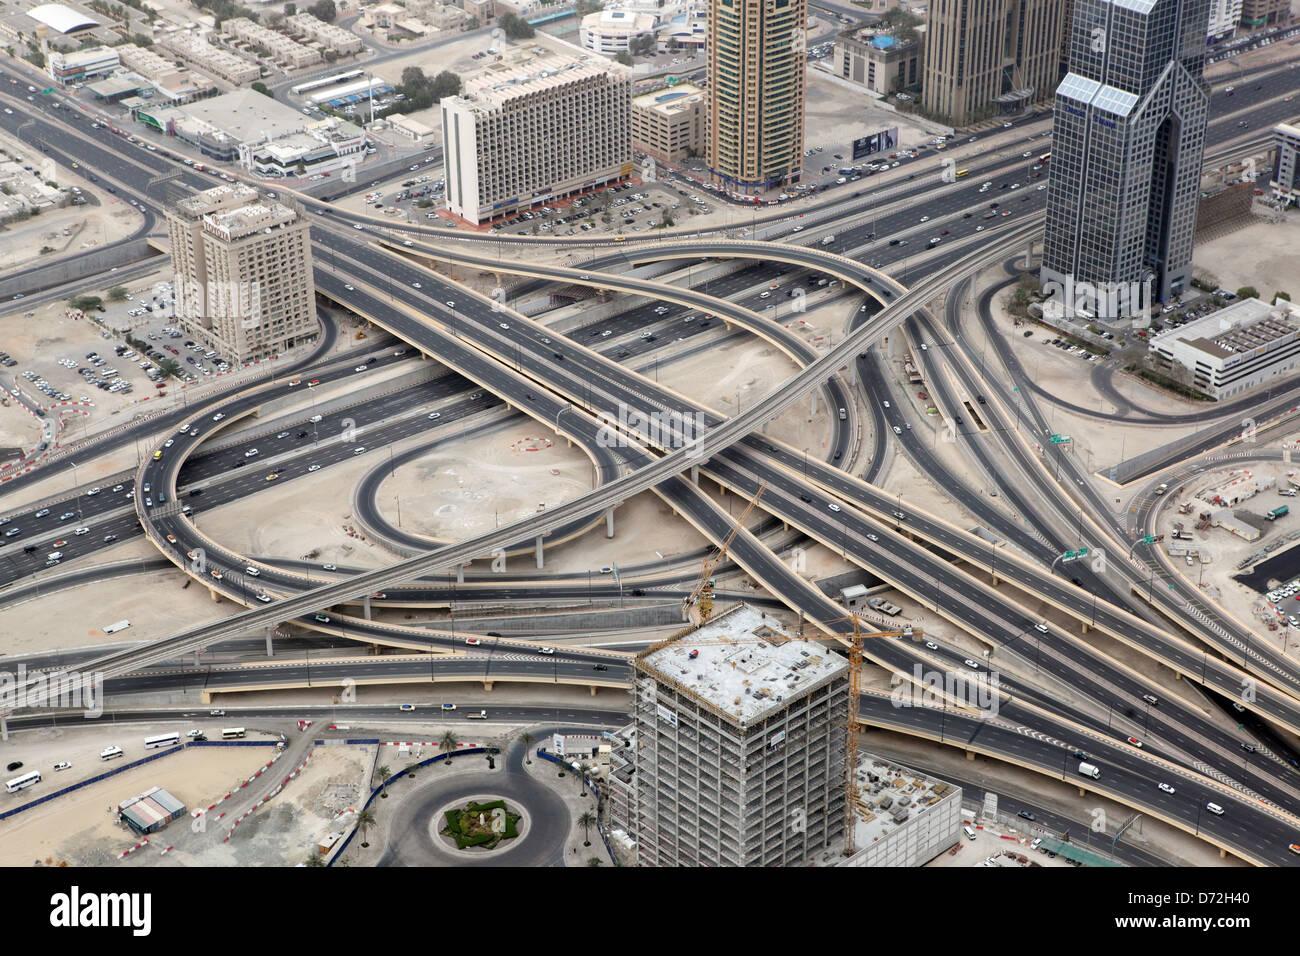 Zayed Stock Photos & Zayed Stock Images - Alamy